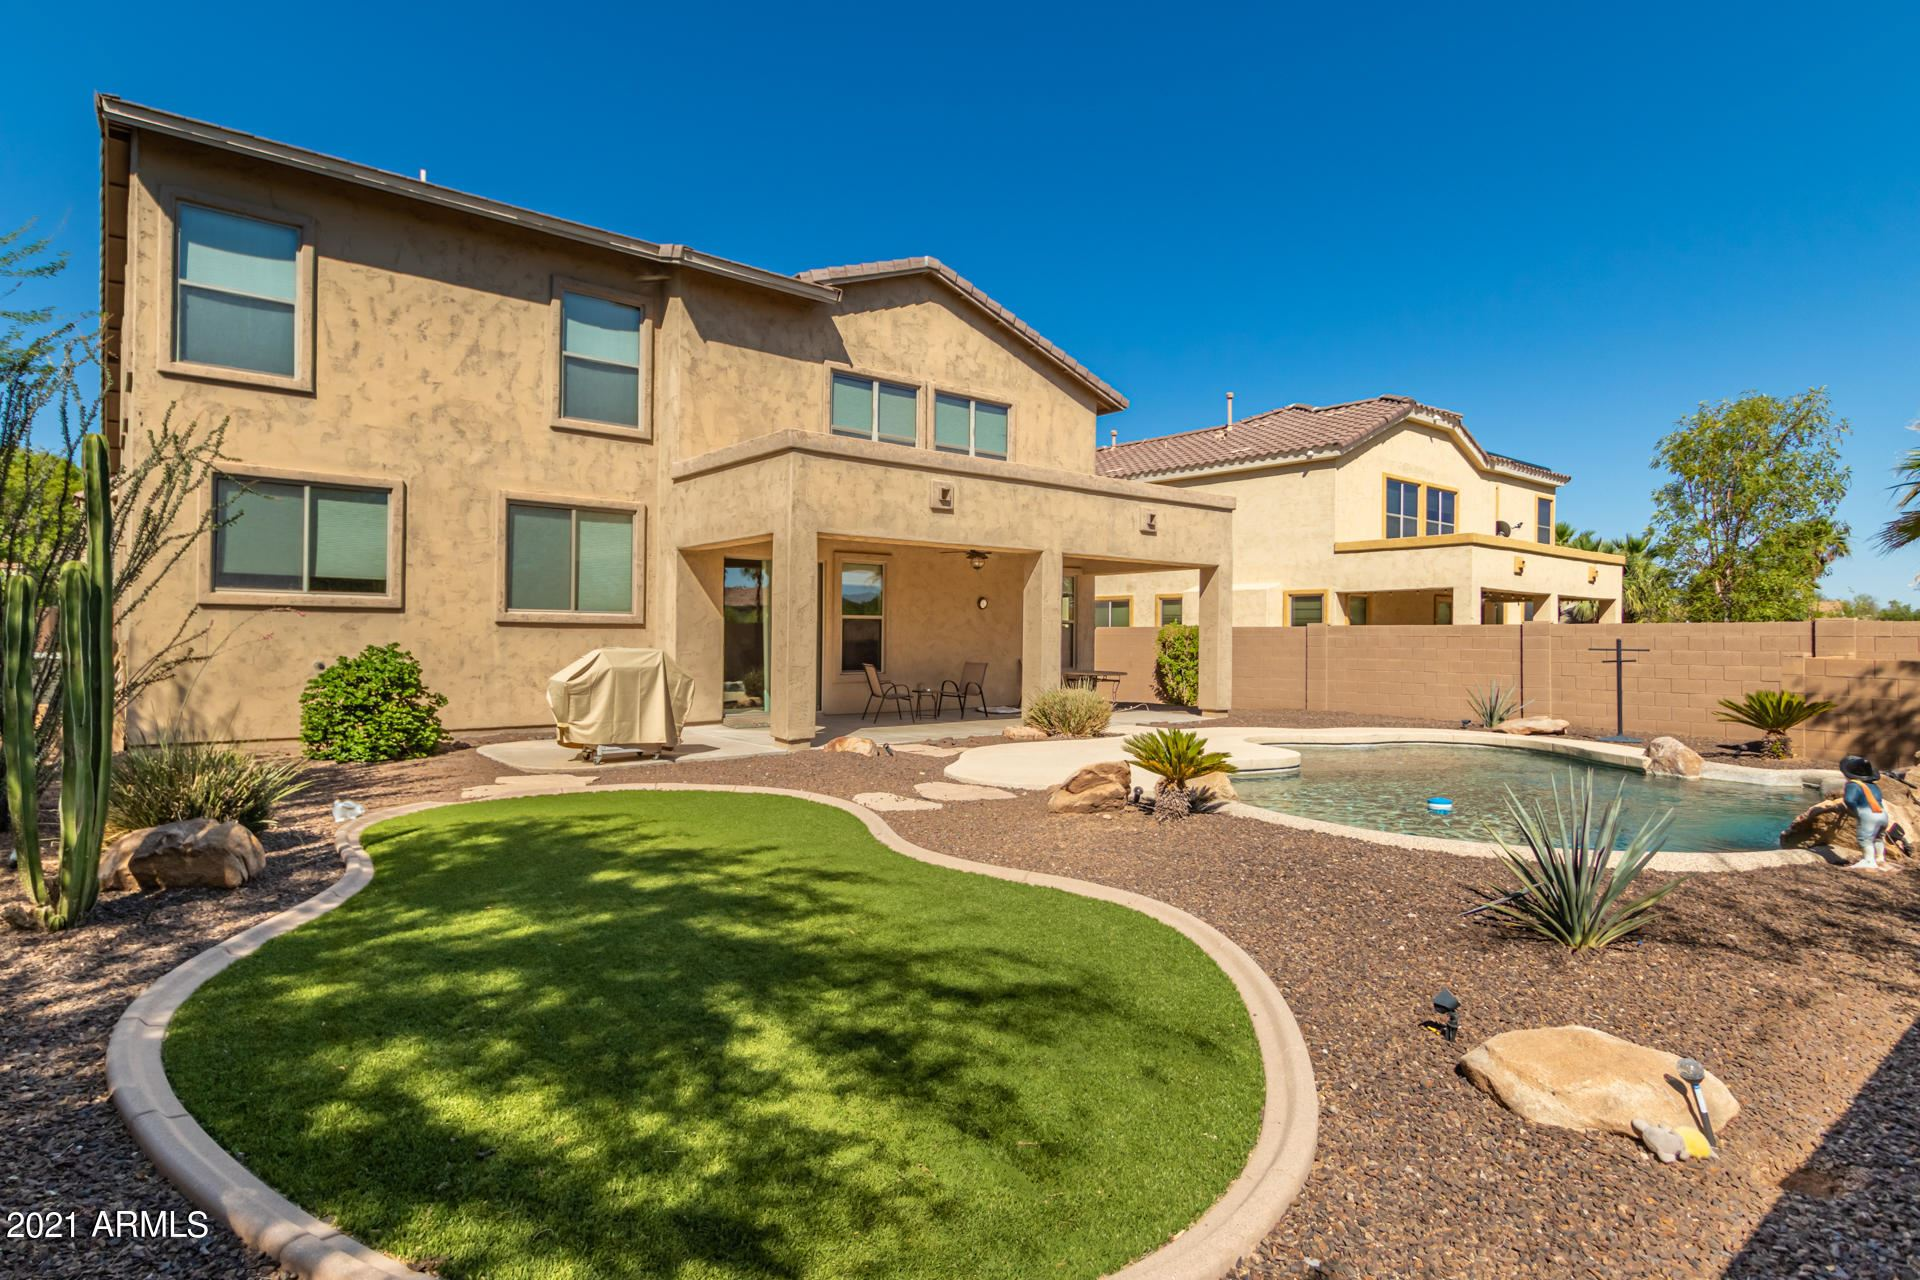 Photo of 25718 N 50TH Glen, Phoenix, AZ 85083 (MLS # 6250113)